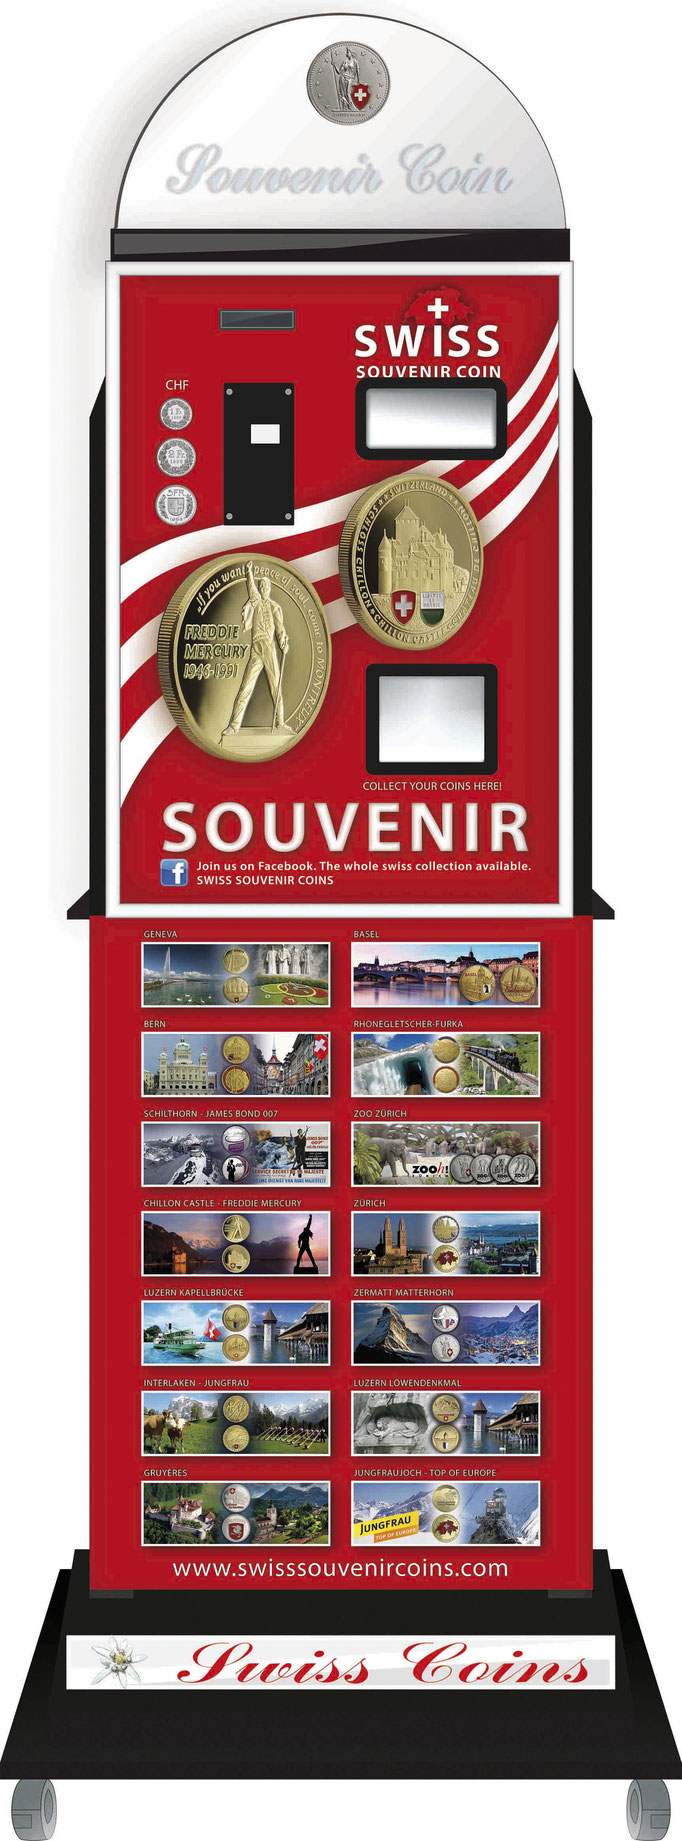 souvenir vending machine Freddie Mercury